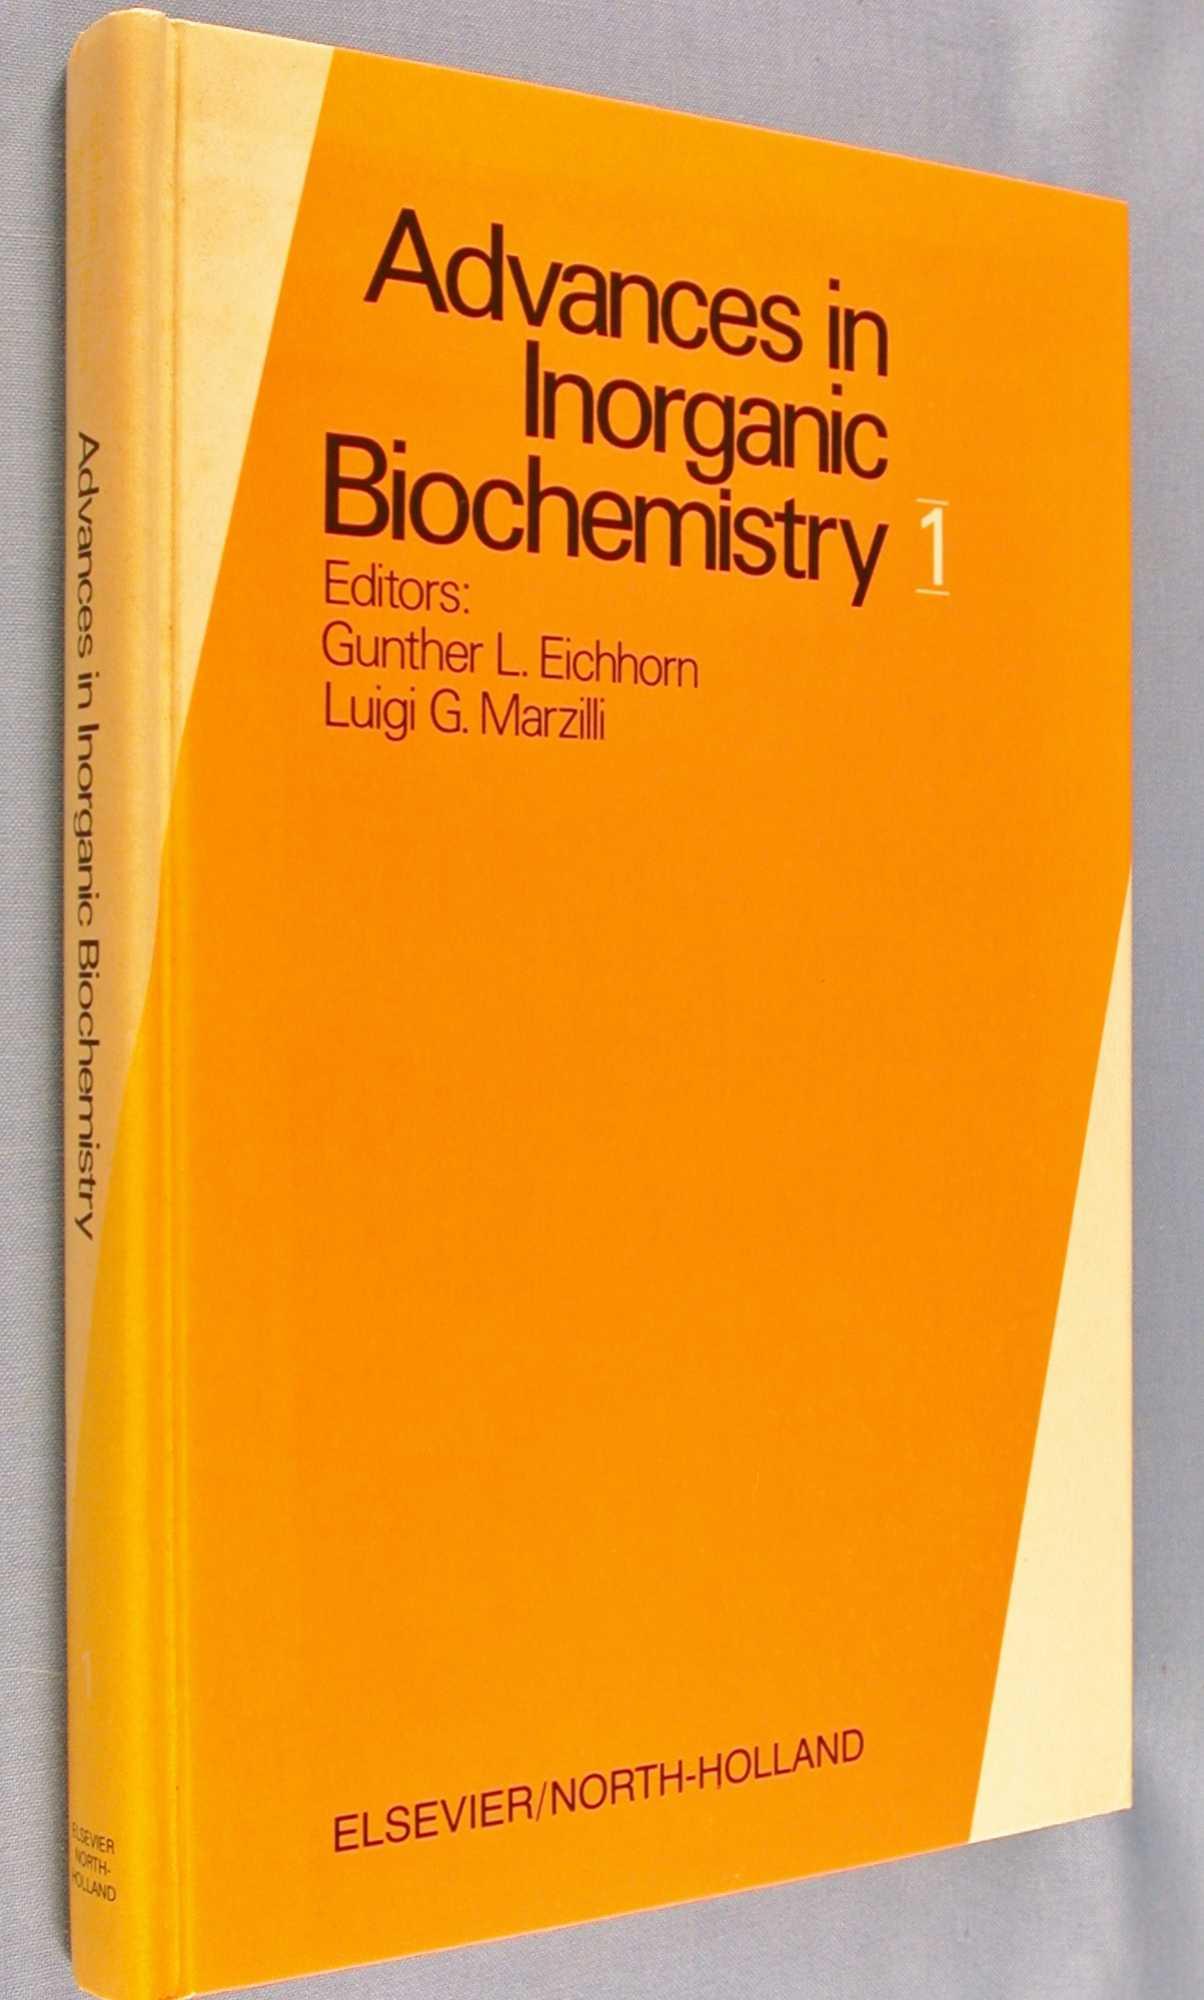 Advances in Inorganic Biochemistry 1, Eichhorn, Gunther L.; Luigi G. Marzilli (editors)